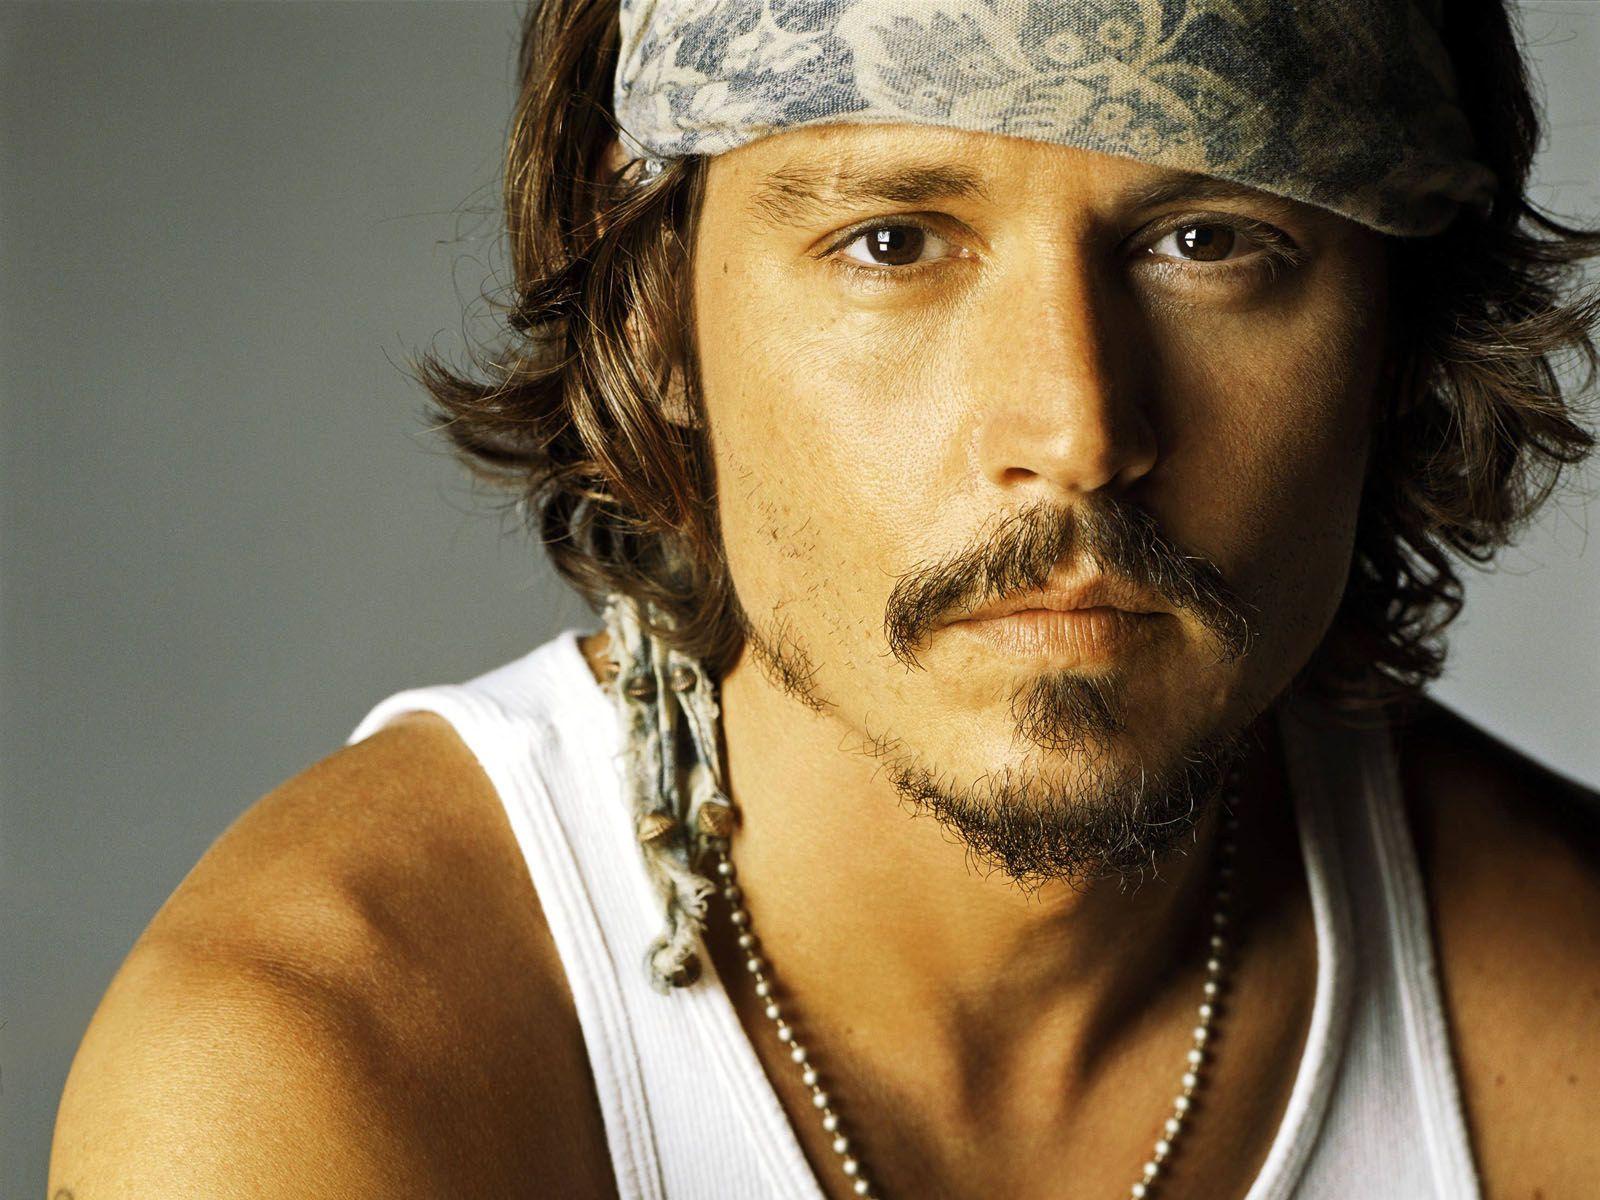 http://1.bp.blogspot.com/-qJgXXdJwY_k/T-L8_p2N96I/AAAAAAAACdQ/ViEag5eLz3U/s1600/Johnny+Depp+17.jpg